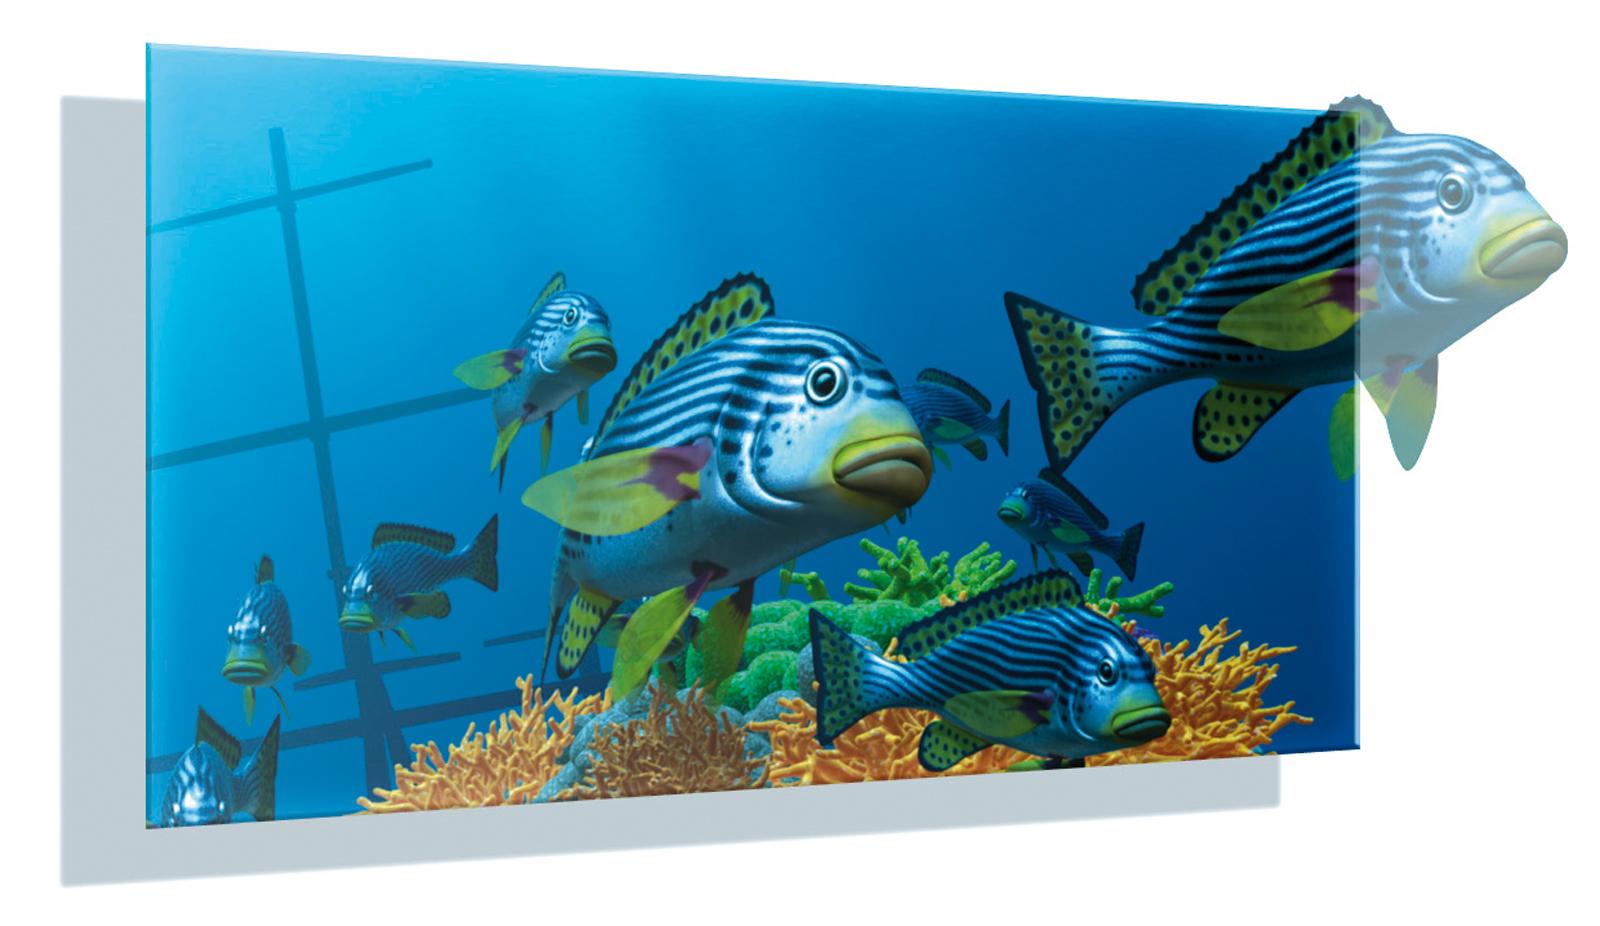 Plakate mit Tiefenwirkung – Werbung in 3-D